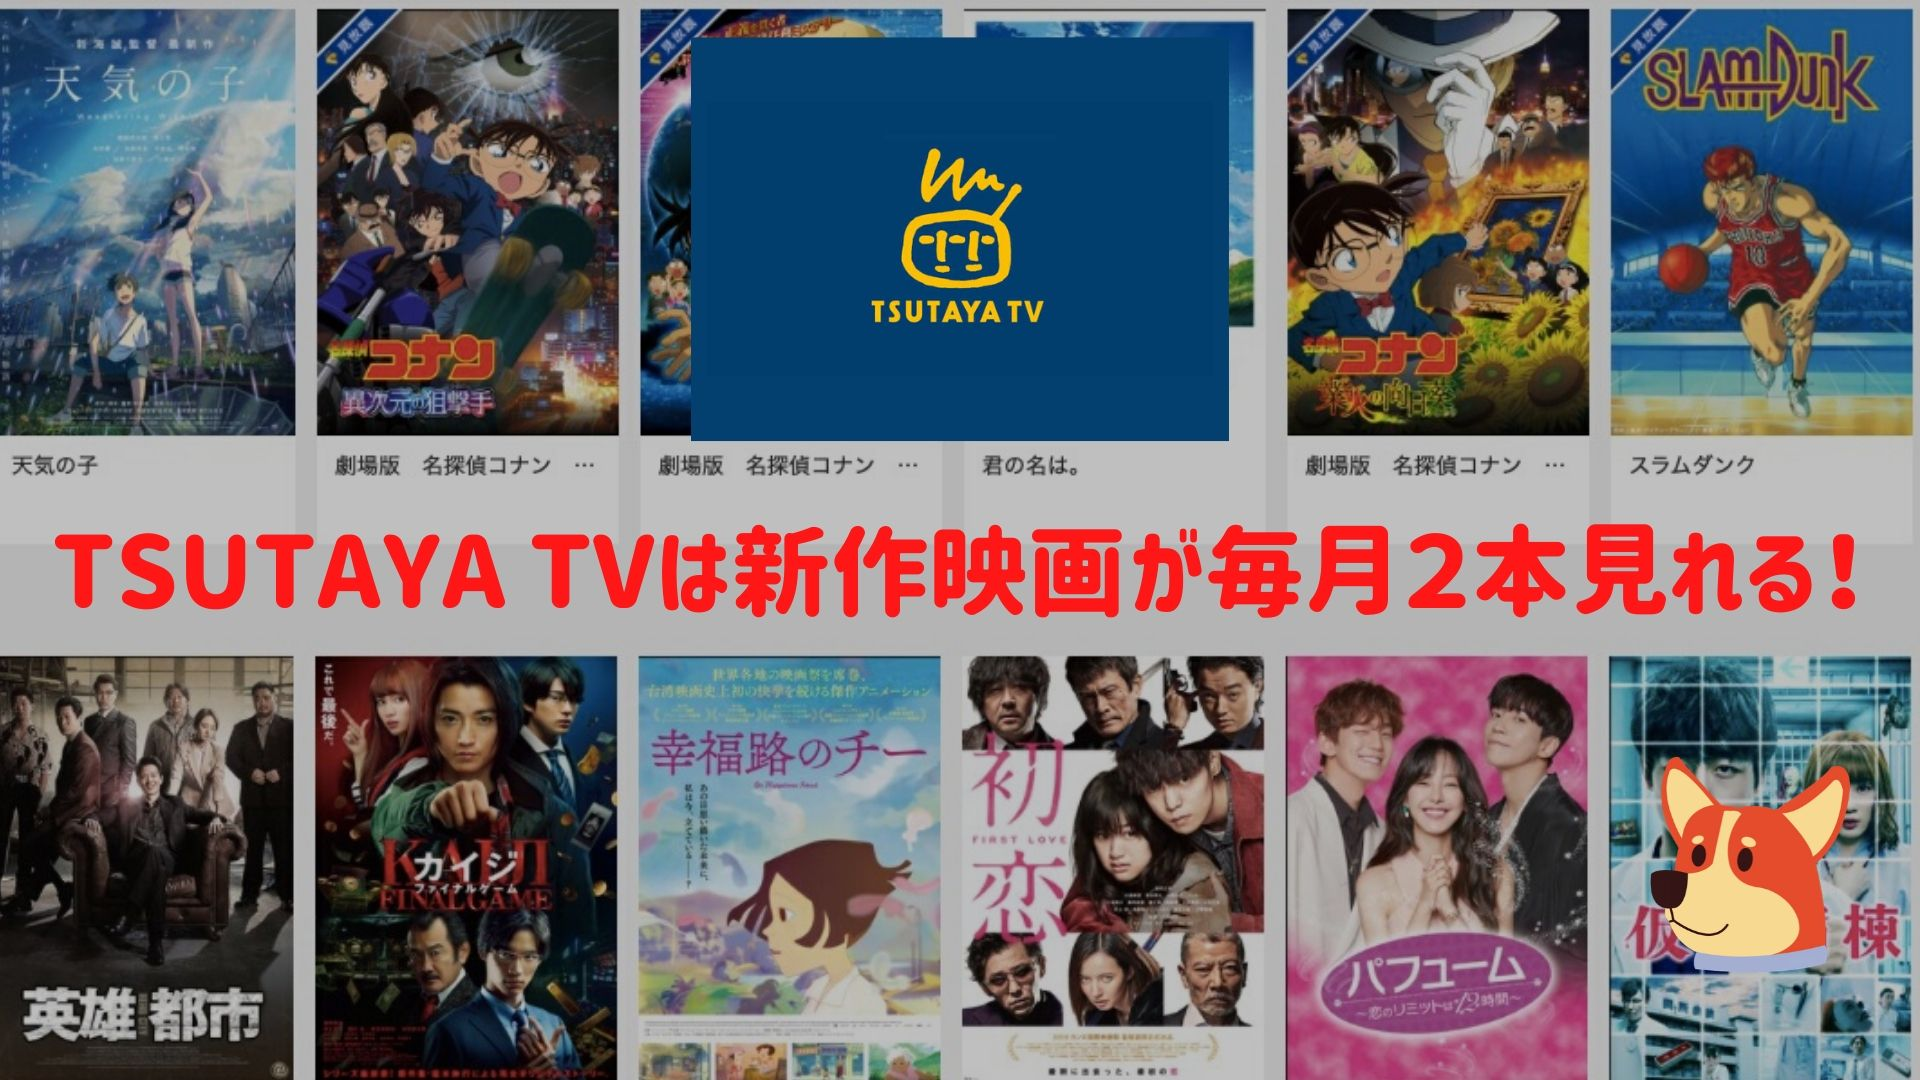 TSUTAYA TVは毎月新作の映画が見れる